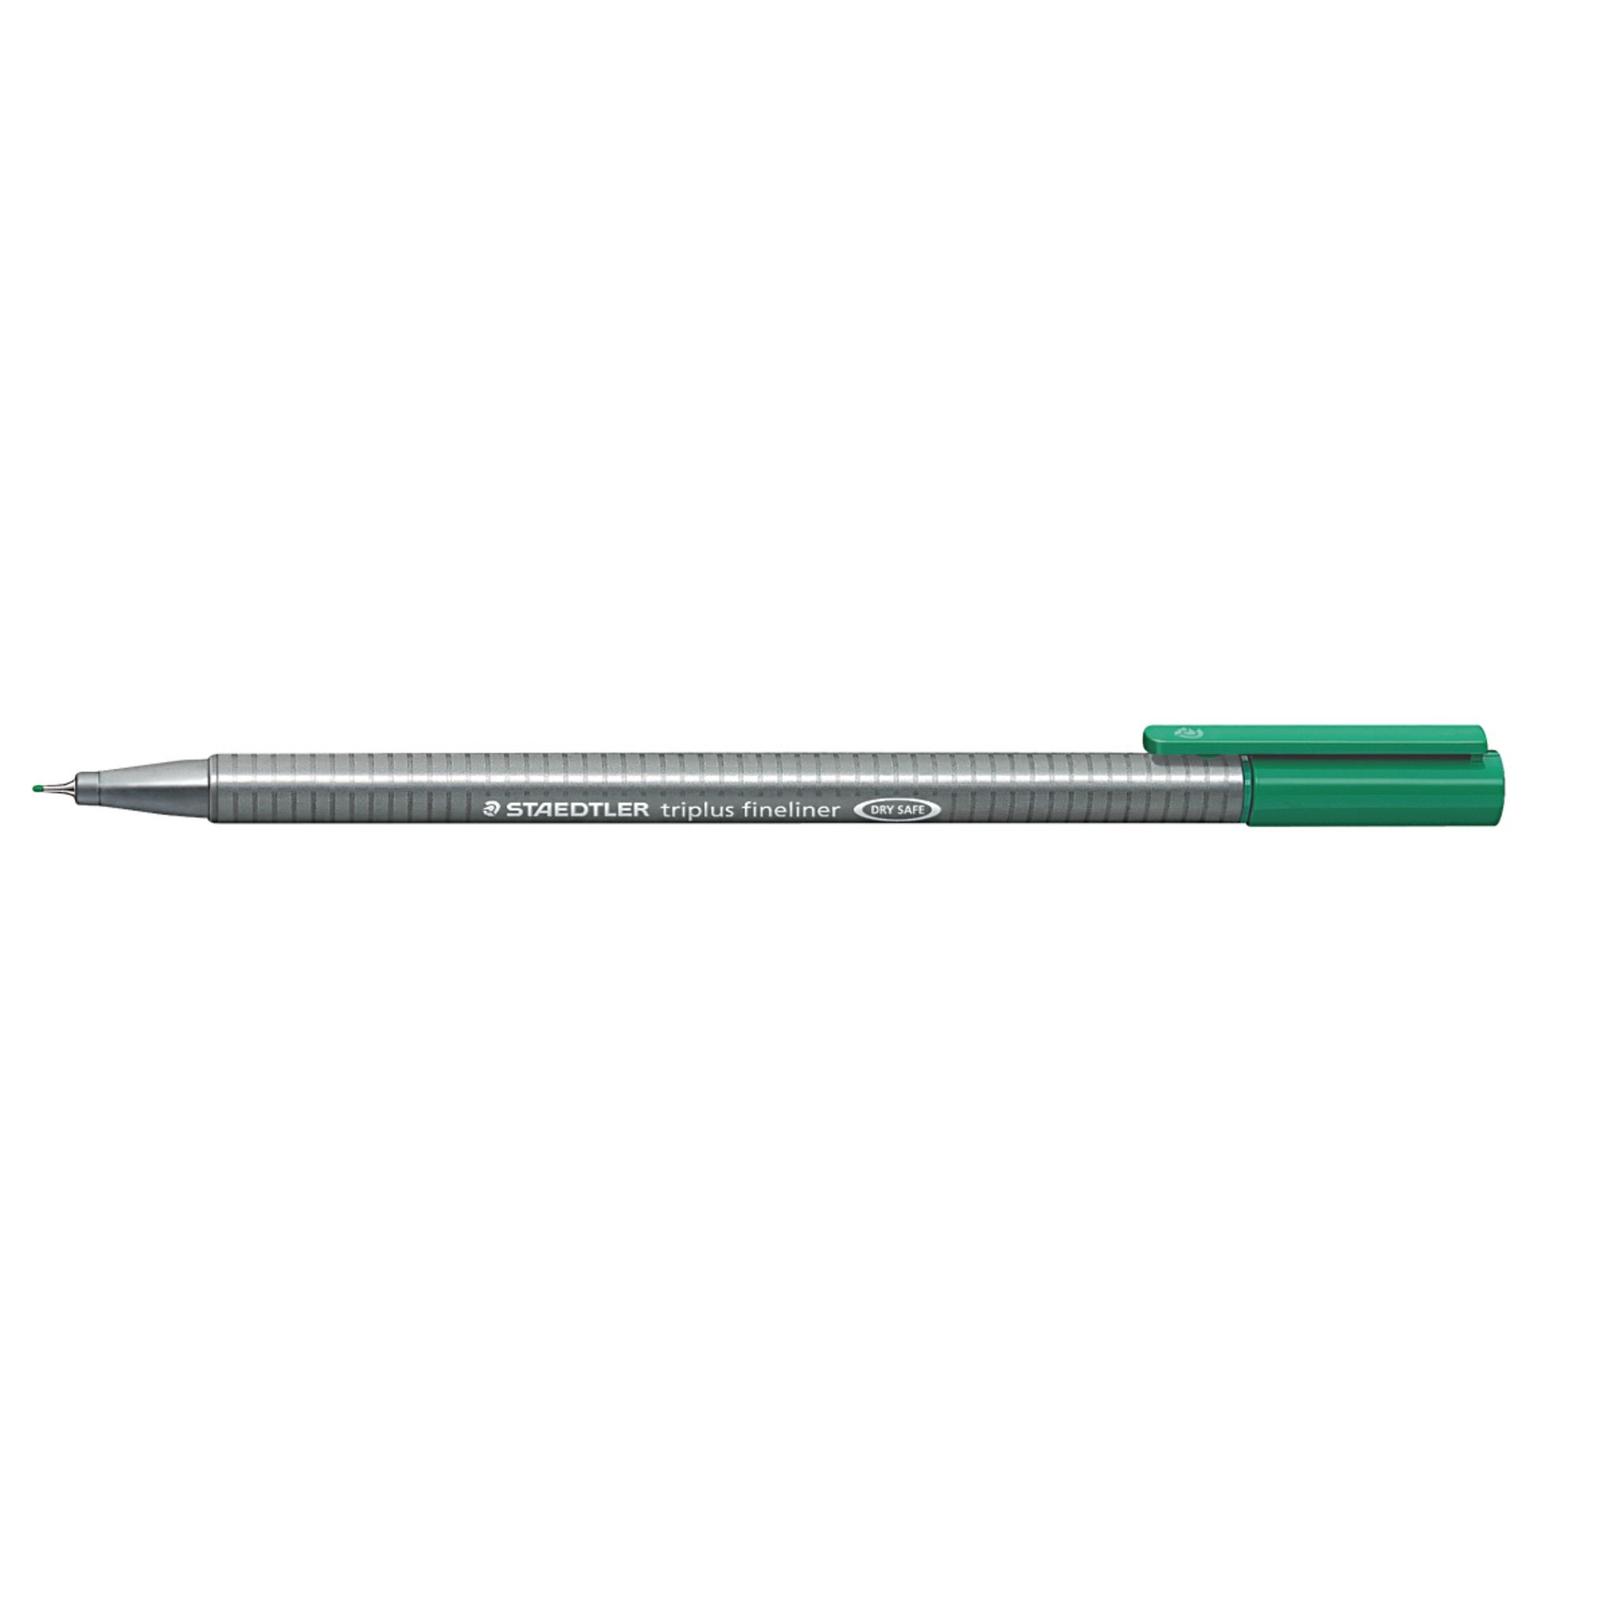 Staedtler Triplus 334 Fineliner Pen Green - Pack of 10